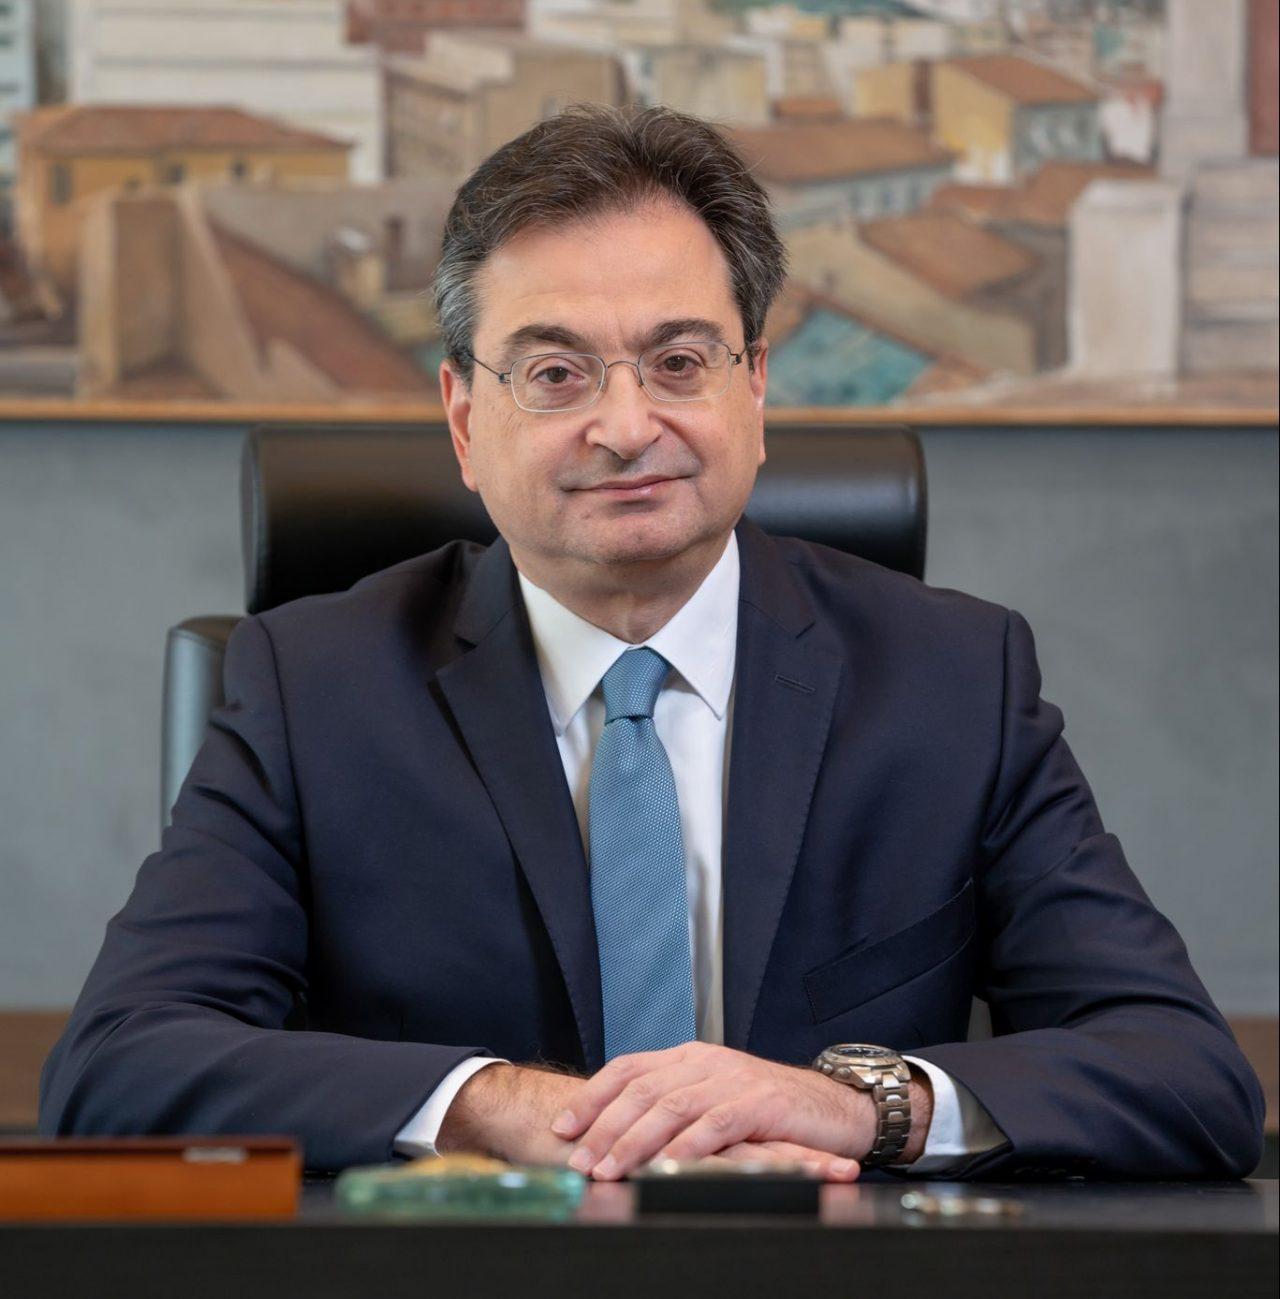 JP Morgan: Top pick η Εurobank μετά τα αποτελέσματα με τιμή στόχο τα 1,10 ευρώ